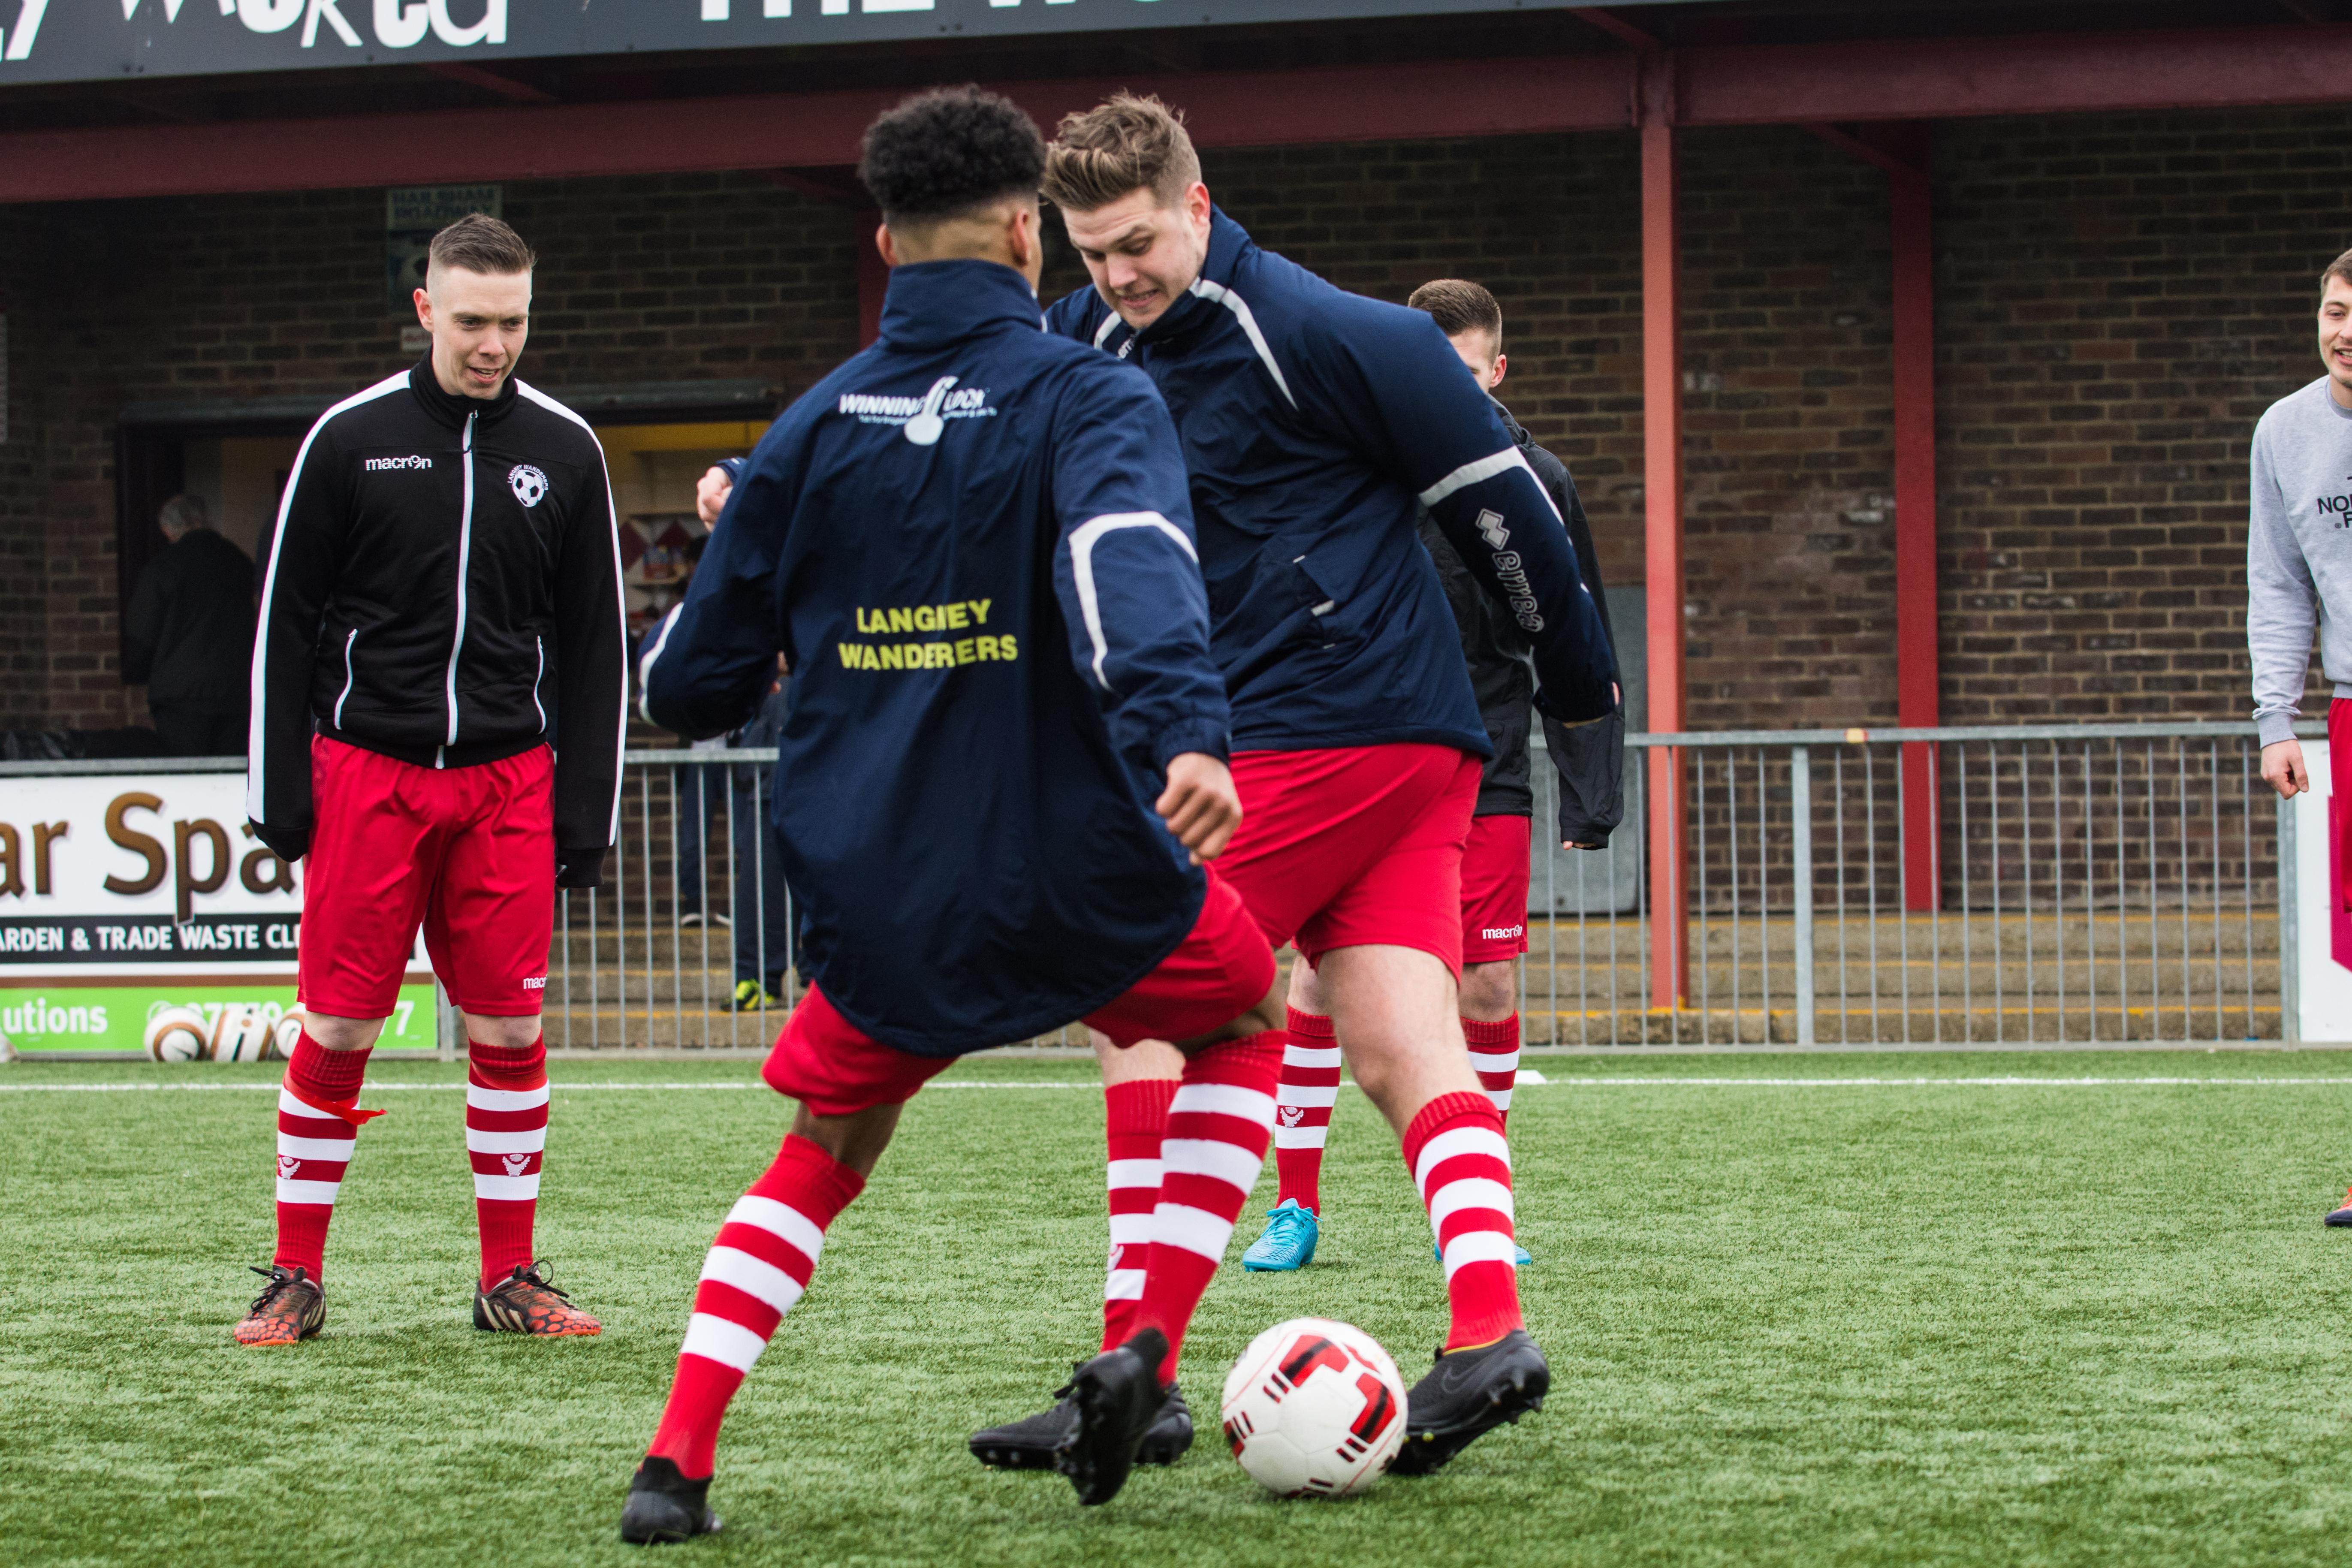 DAVID_JEFFERY Langney Wanderers FC vs Bexhill United FC 03.03.18 07